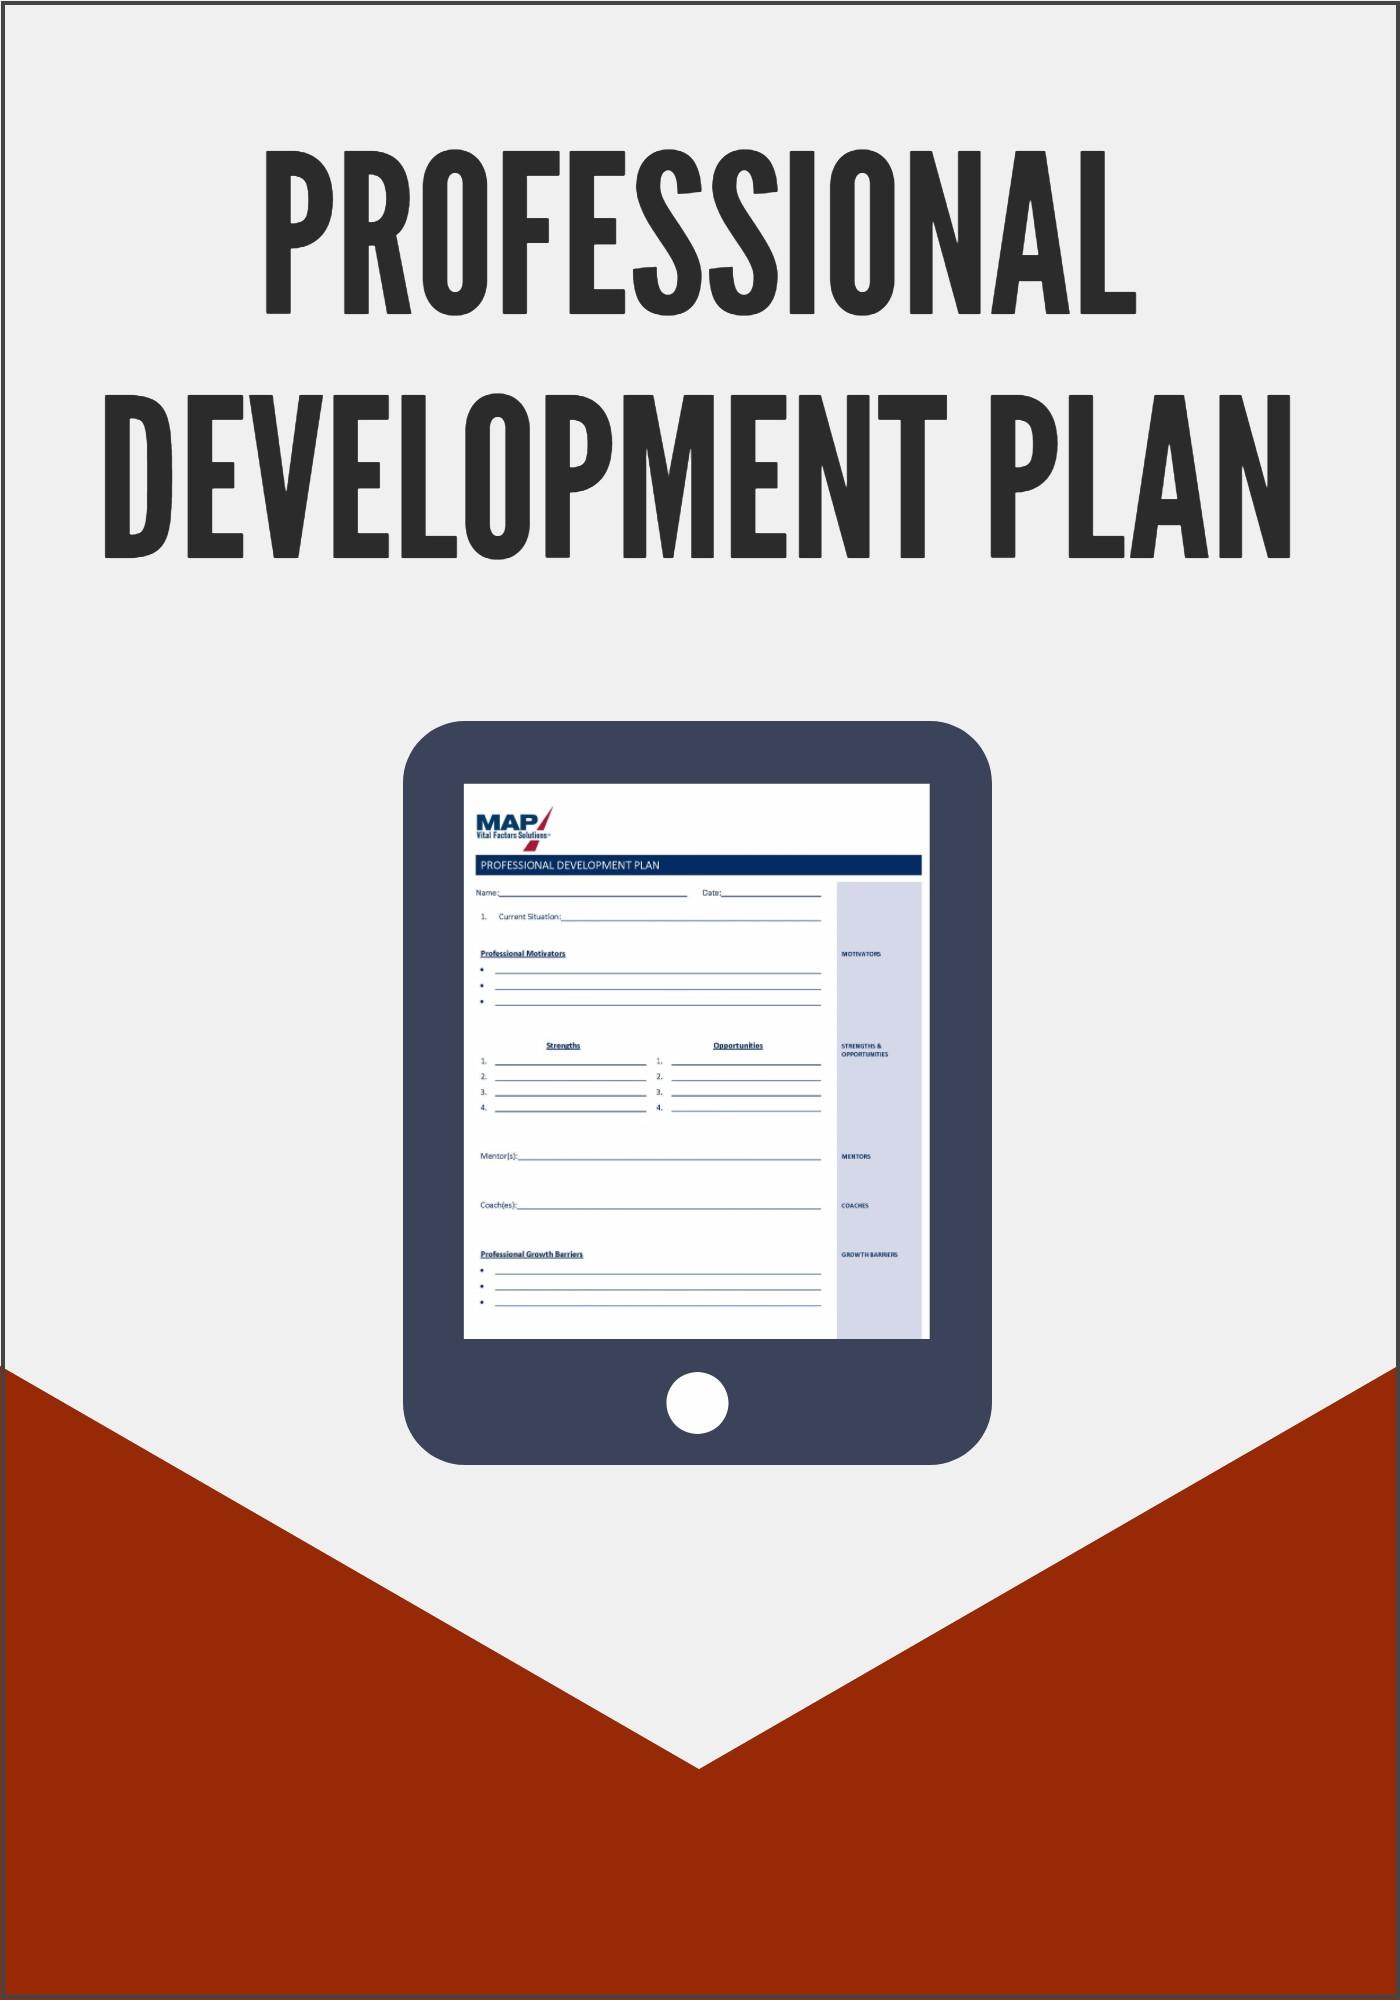 Professional Development Plan Template